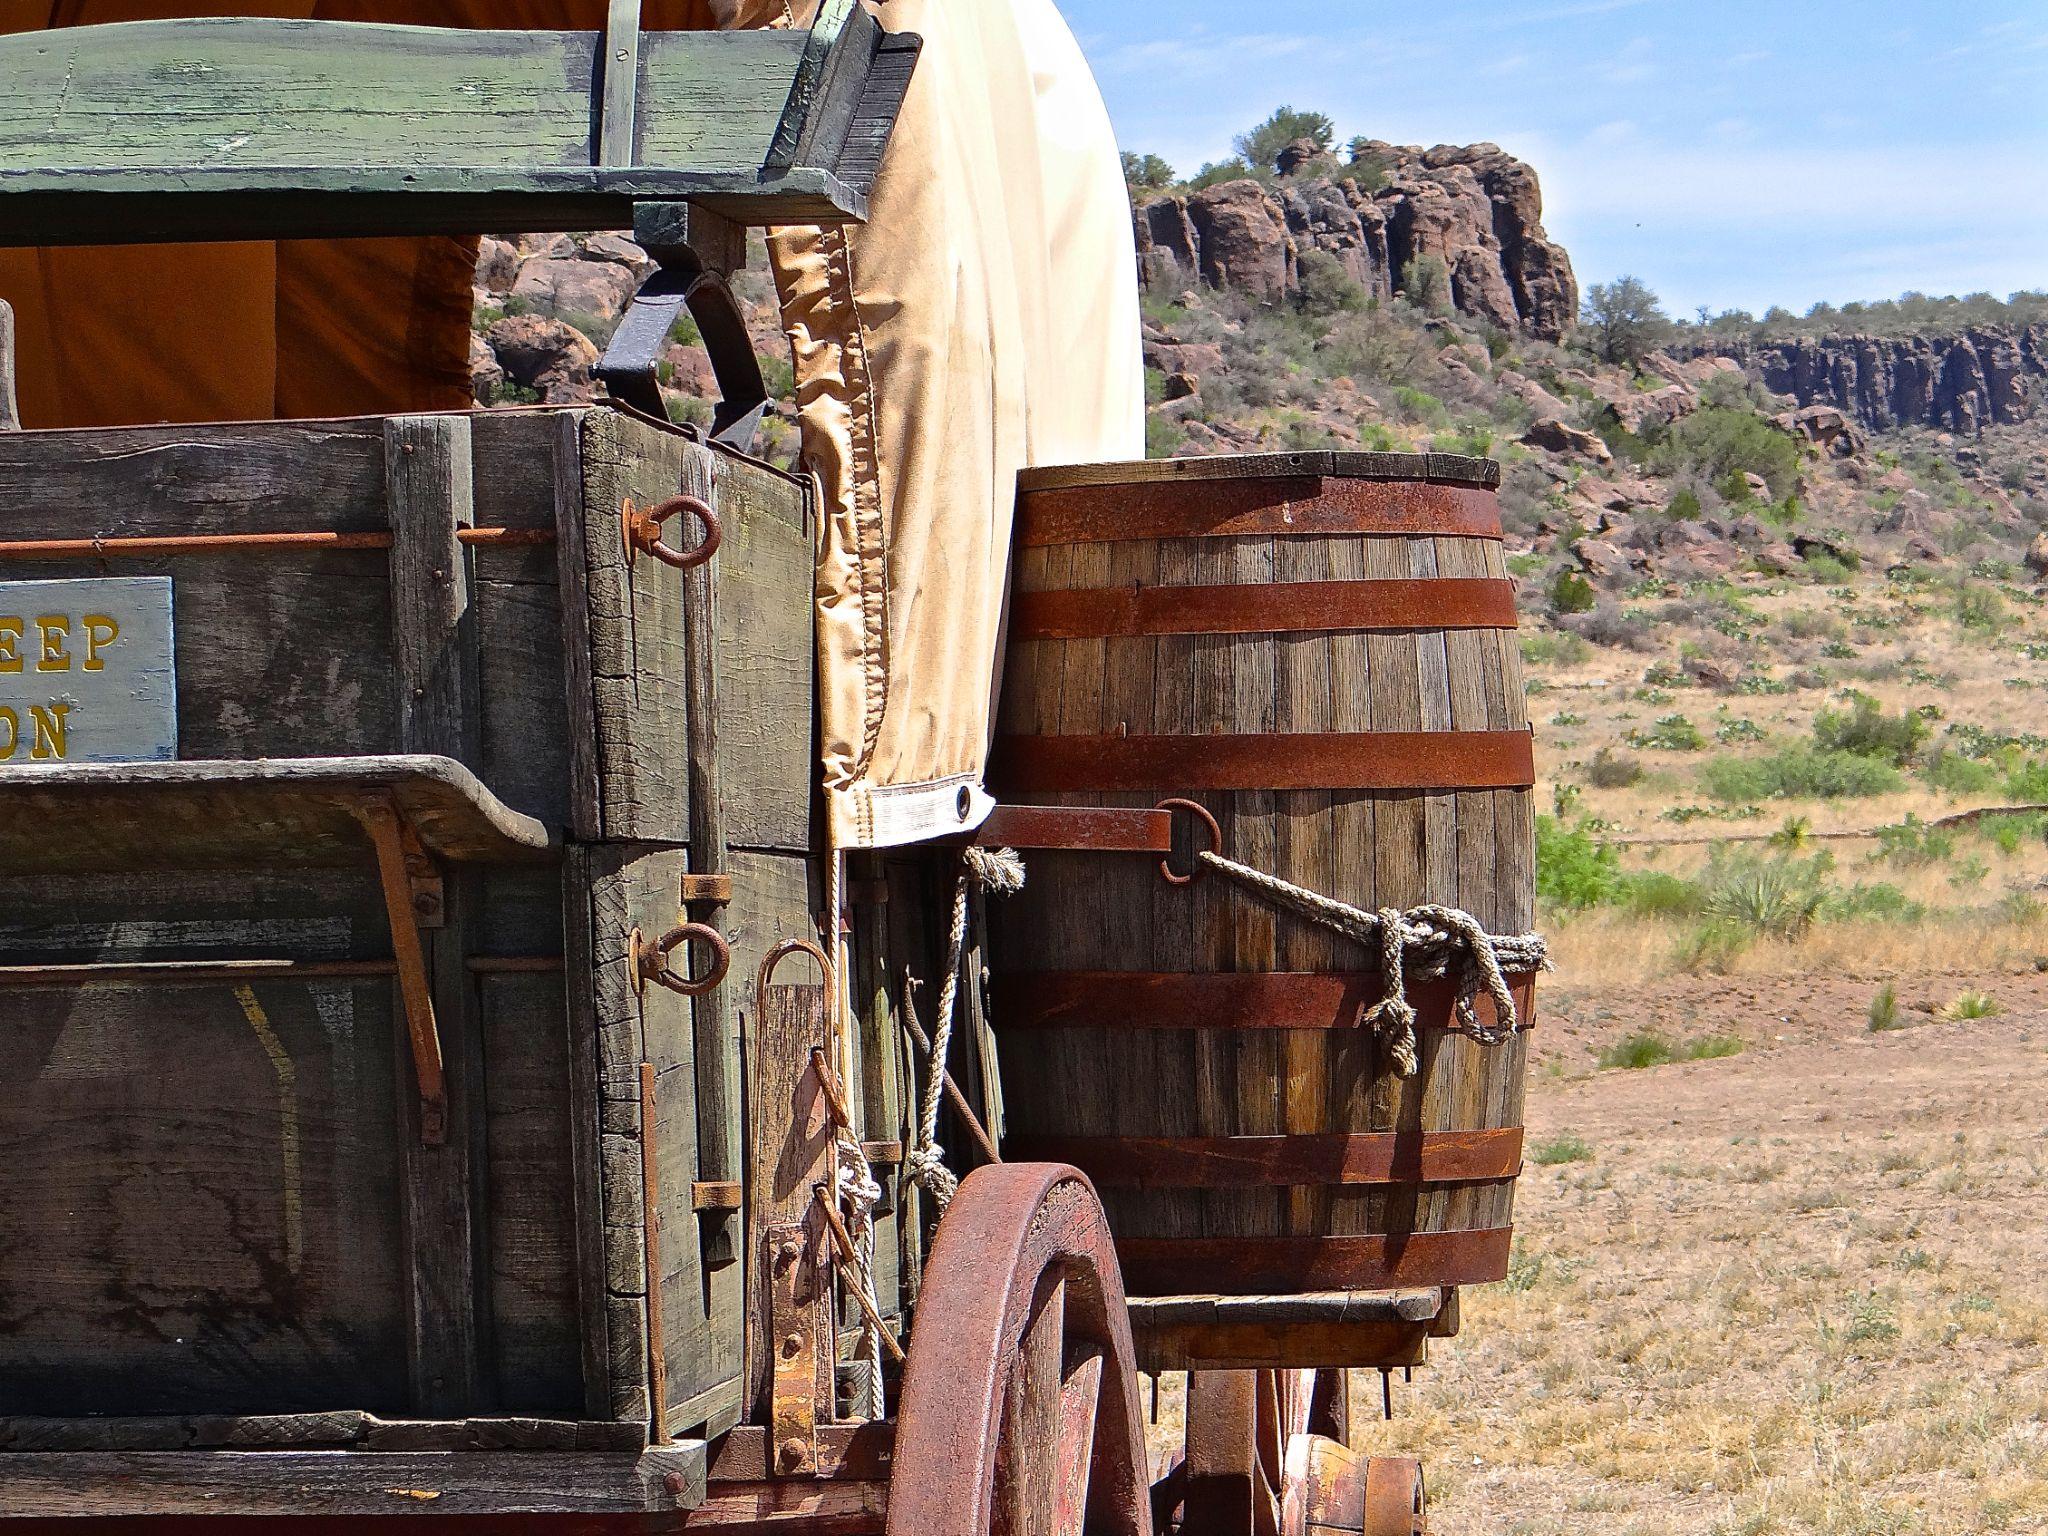 Water Barrel on Wagon by Steve Aicinena